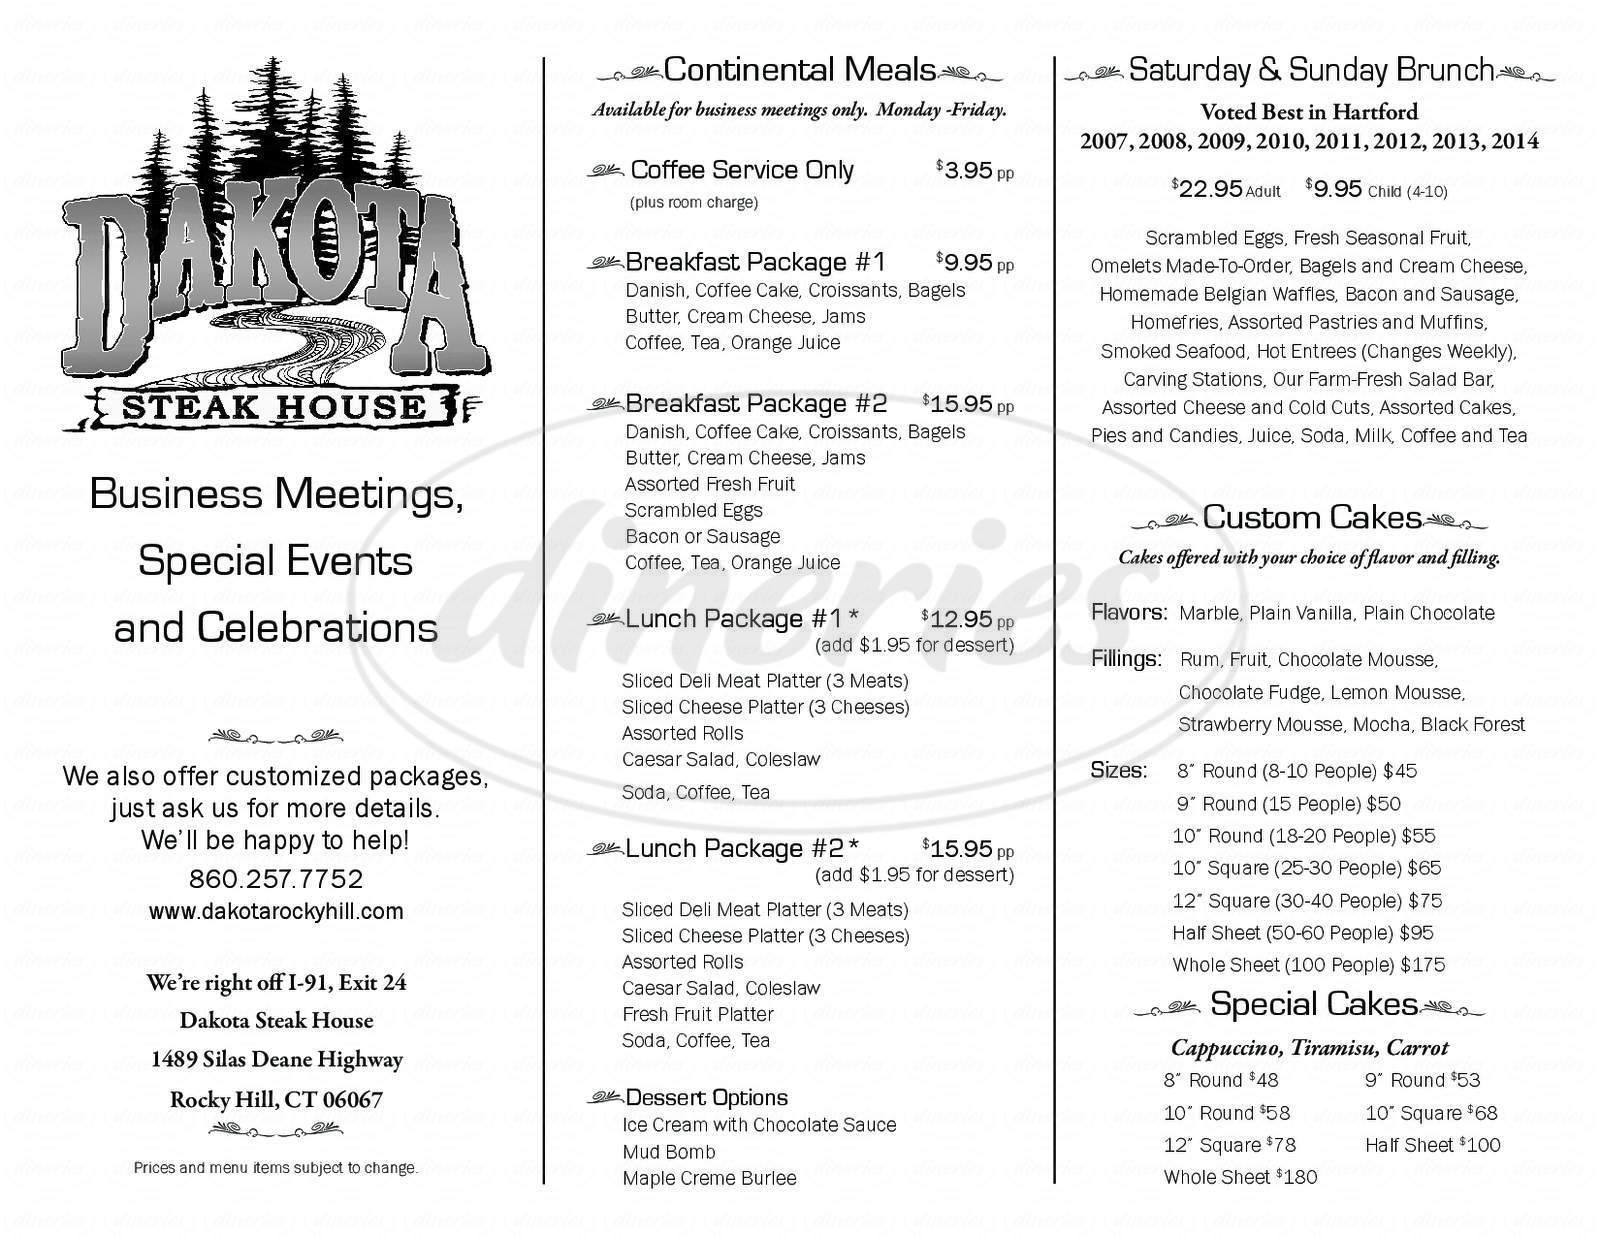 menu for Dakota Steakhouse